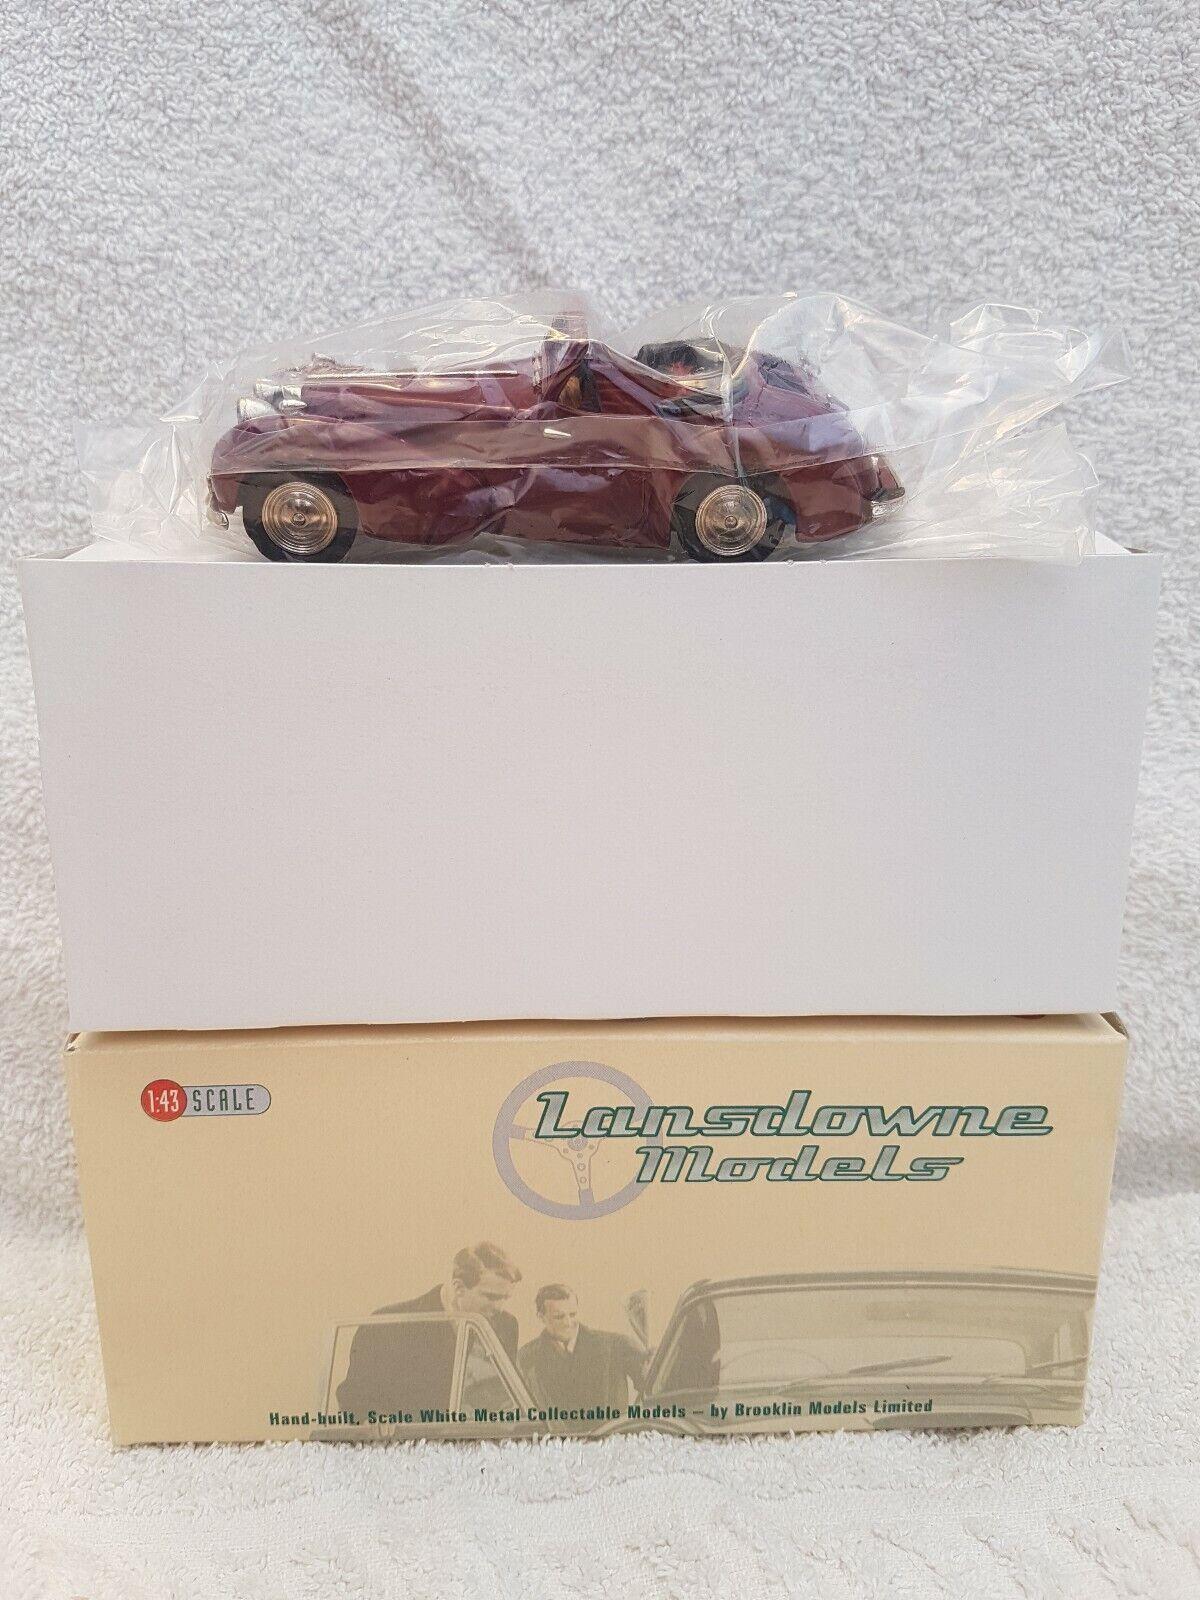 più preferenziale LANSDOWNE modellololi in scala 1 43 LDM37 LDM37 LDM37 - 1949 TRIUMPH 2000 stradaster BERGERAC-Amaranto  prodotti creativi